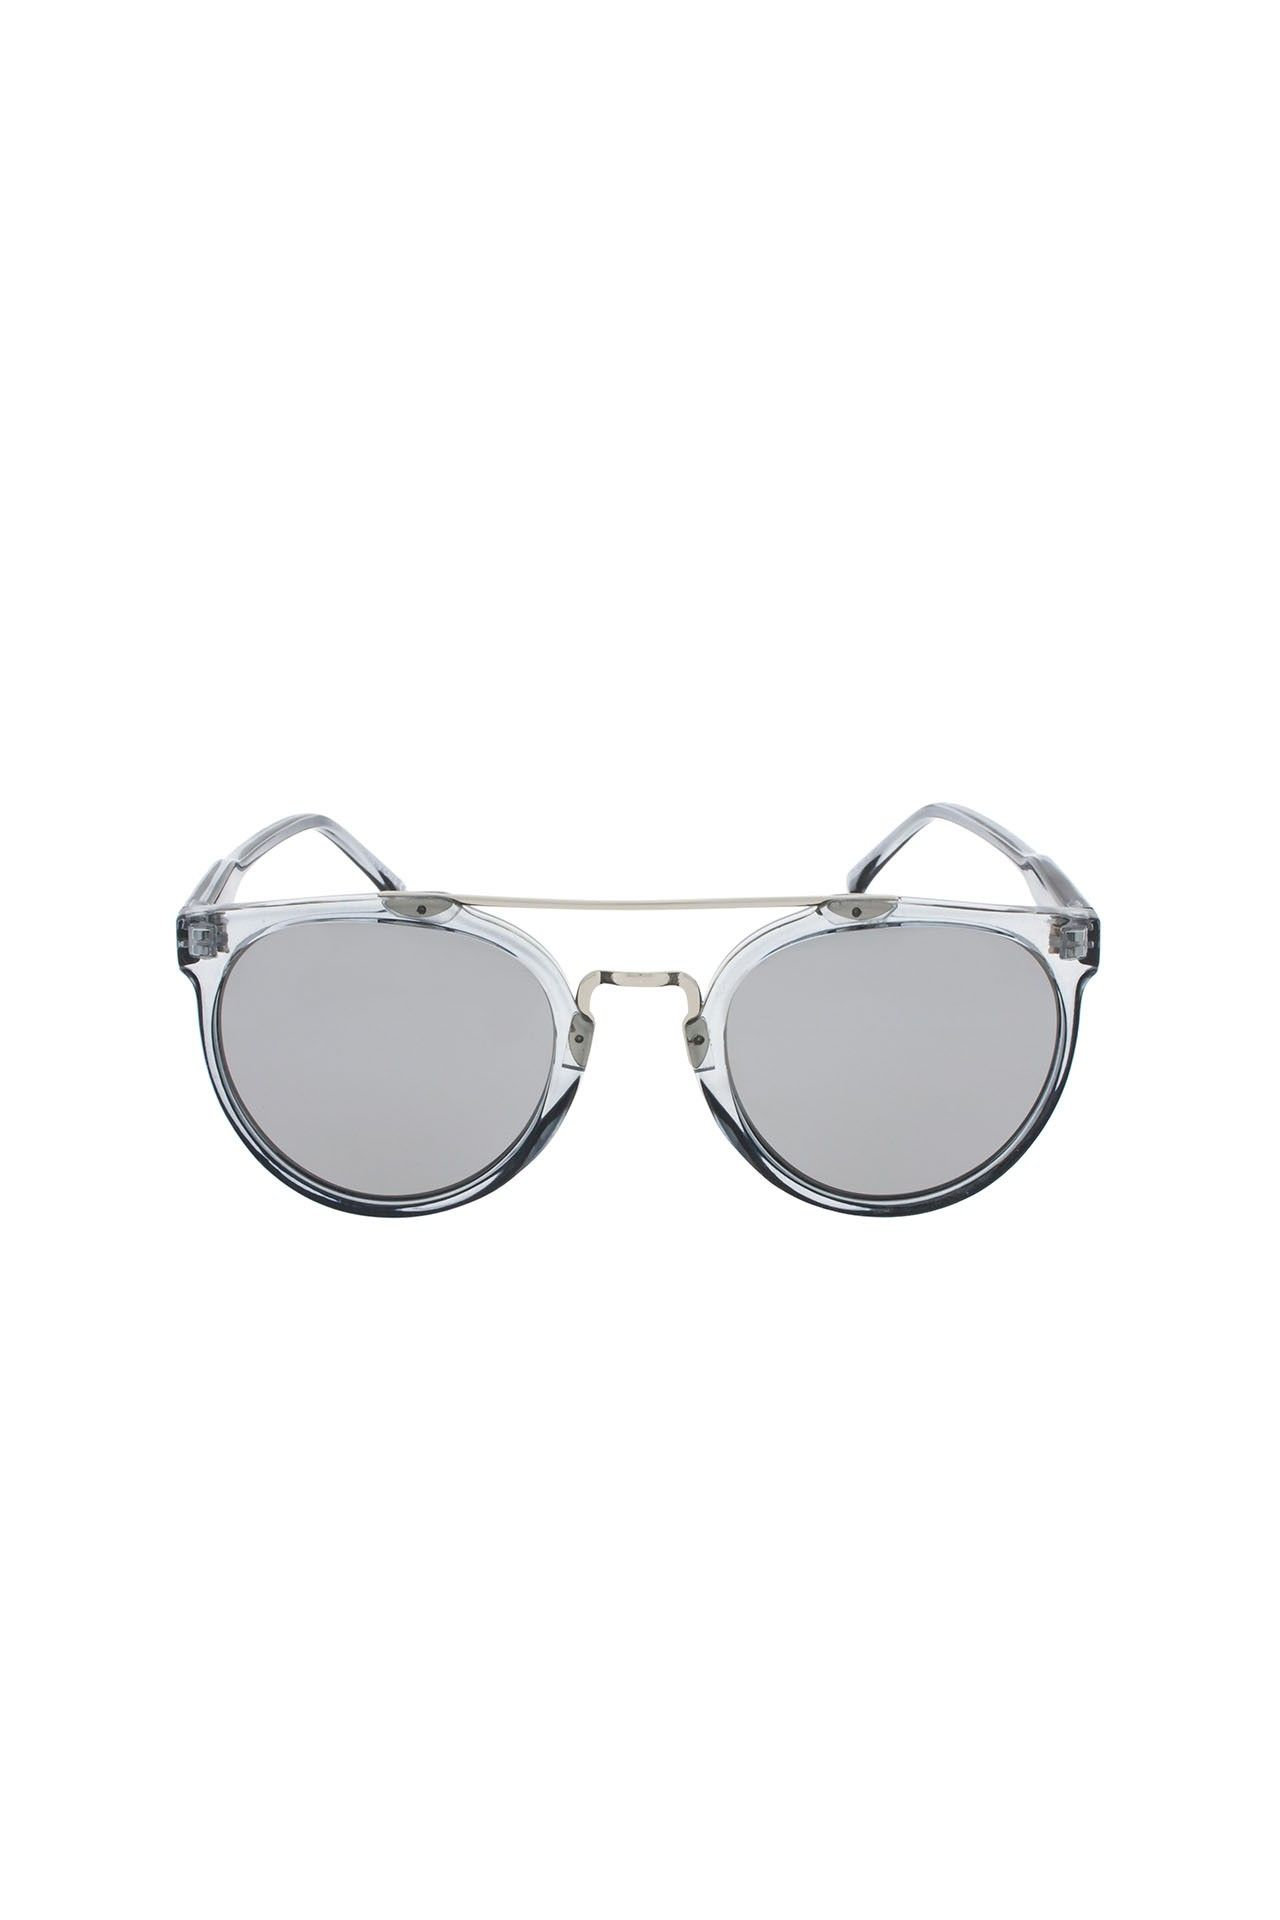 Afbeelding van Icon Eyewear 11619 A Zonnebril Dark Clear Grey